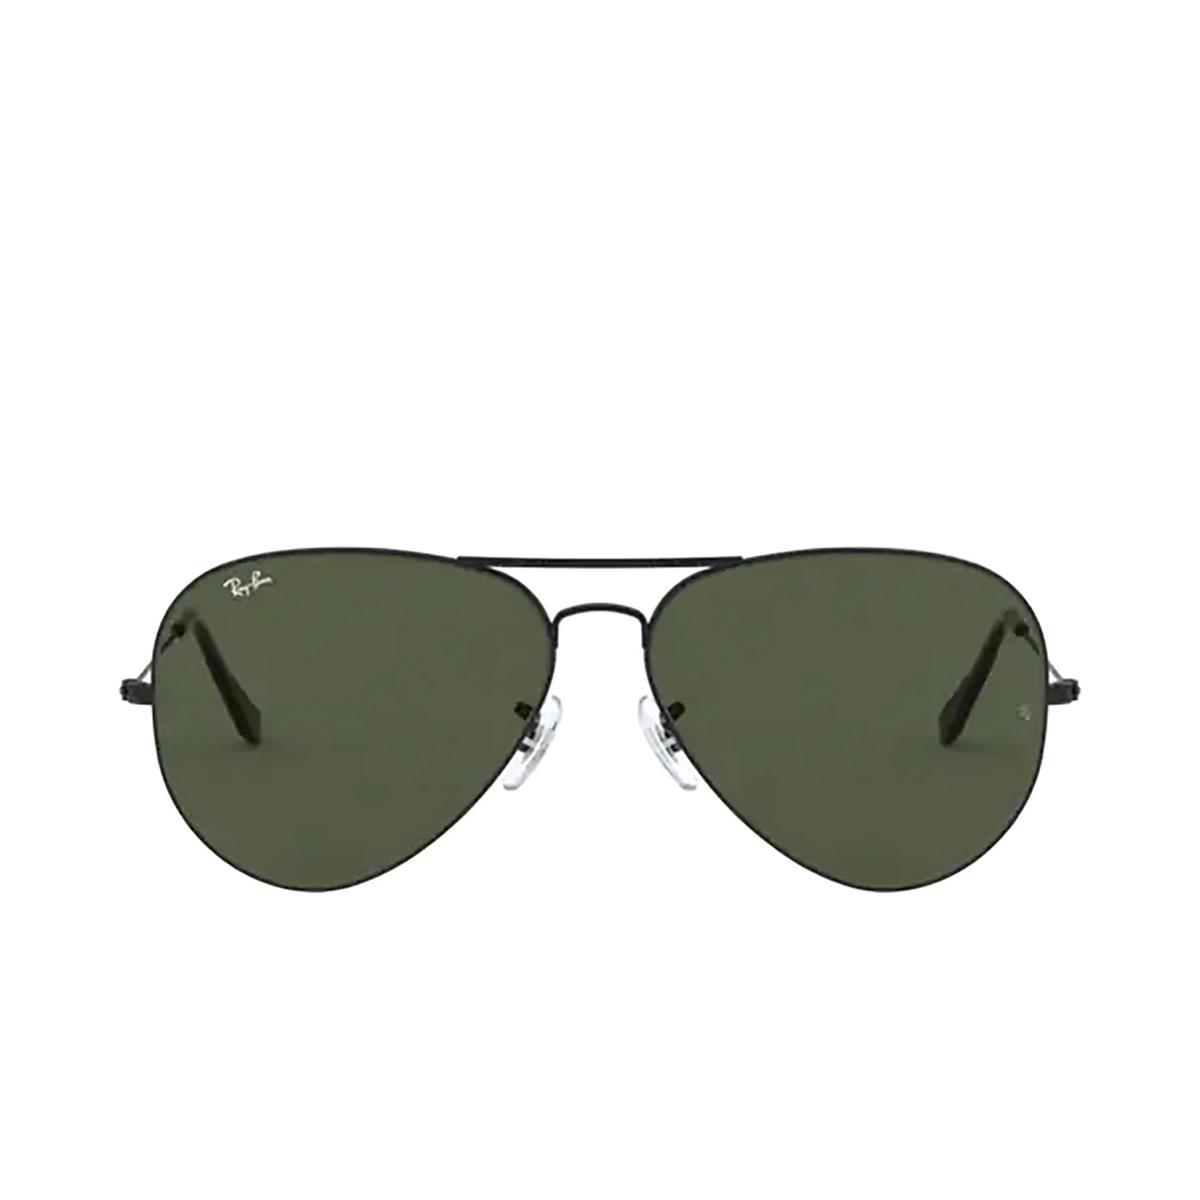 Ray-Ban® Aviator Sunglasses: Aviator Large Metal Ii RB3026 color Black L2821 - 1/3.